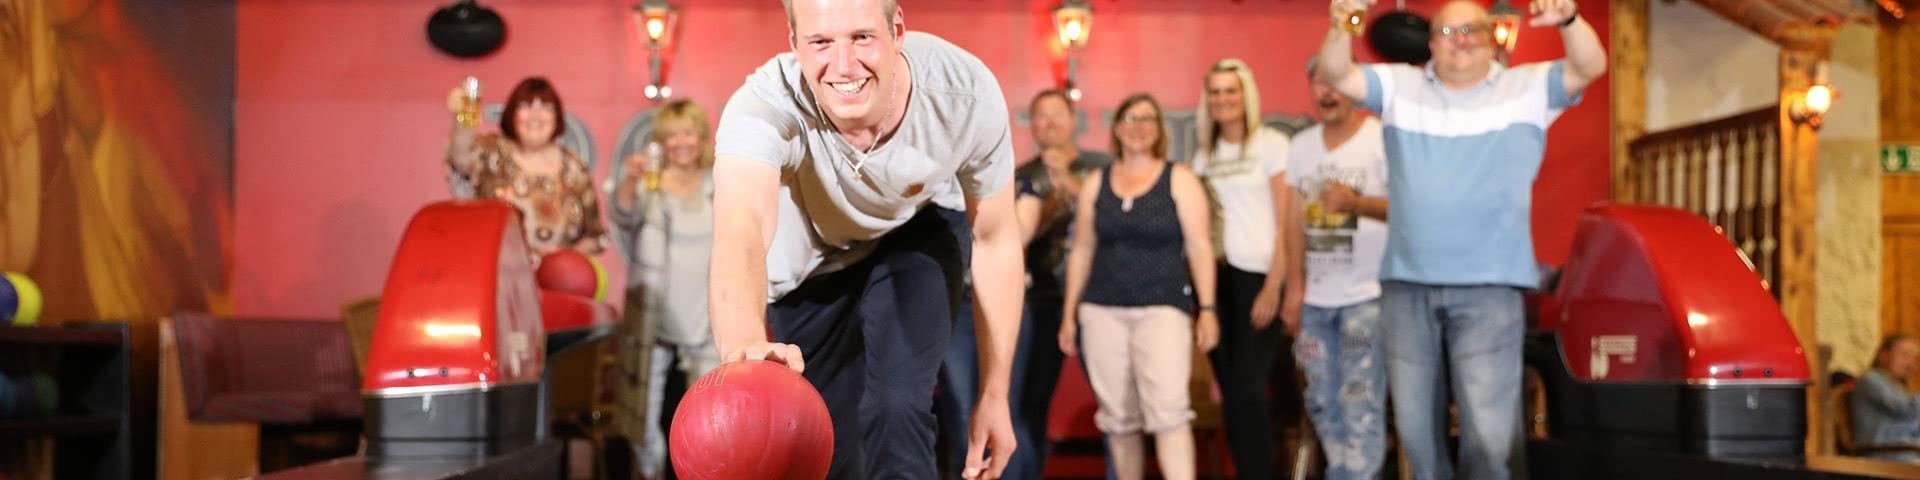 Spaß beim Bowling im Wangerland